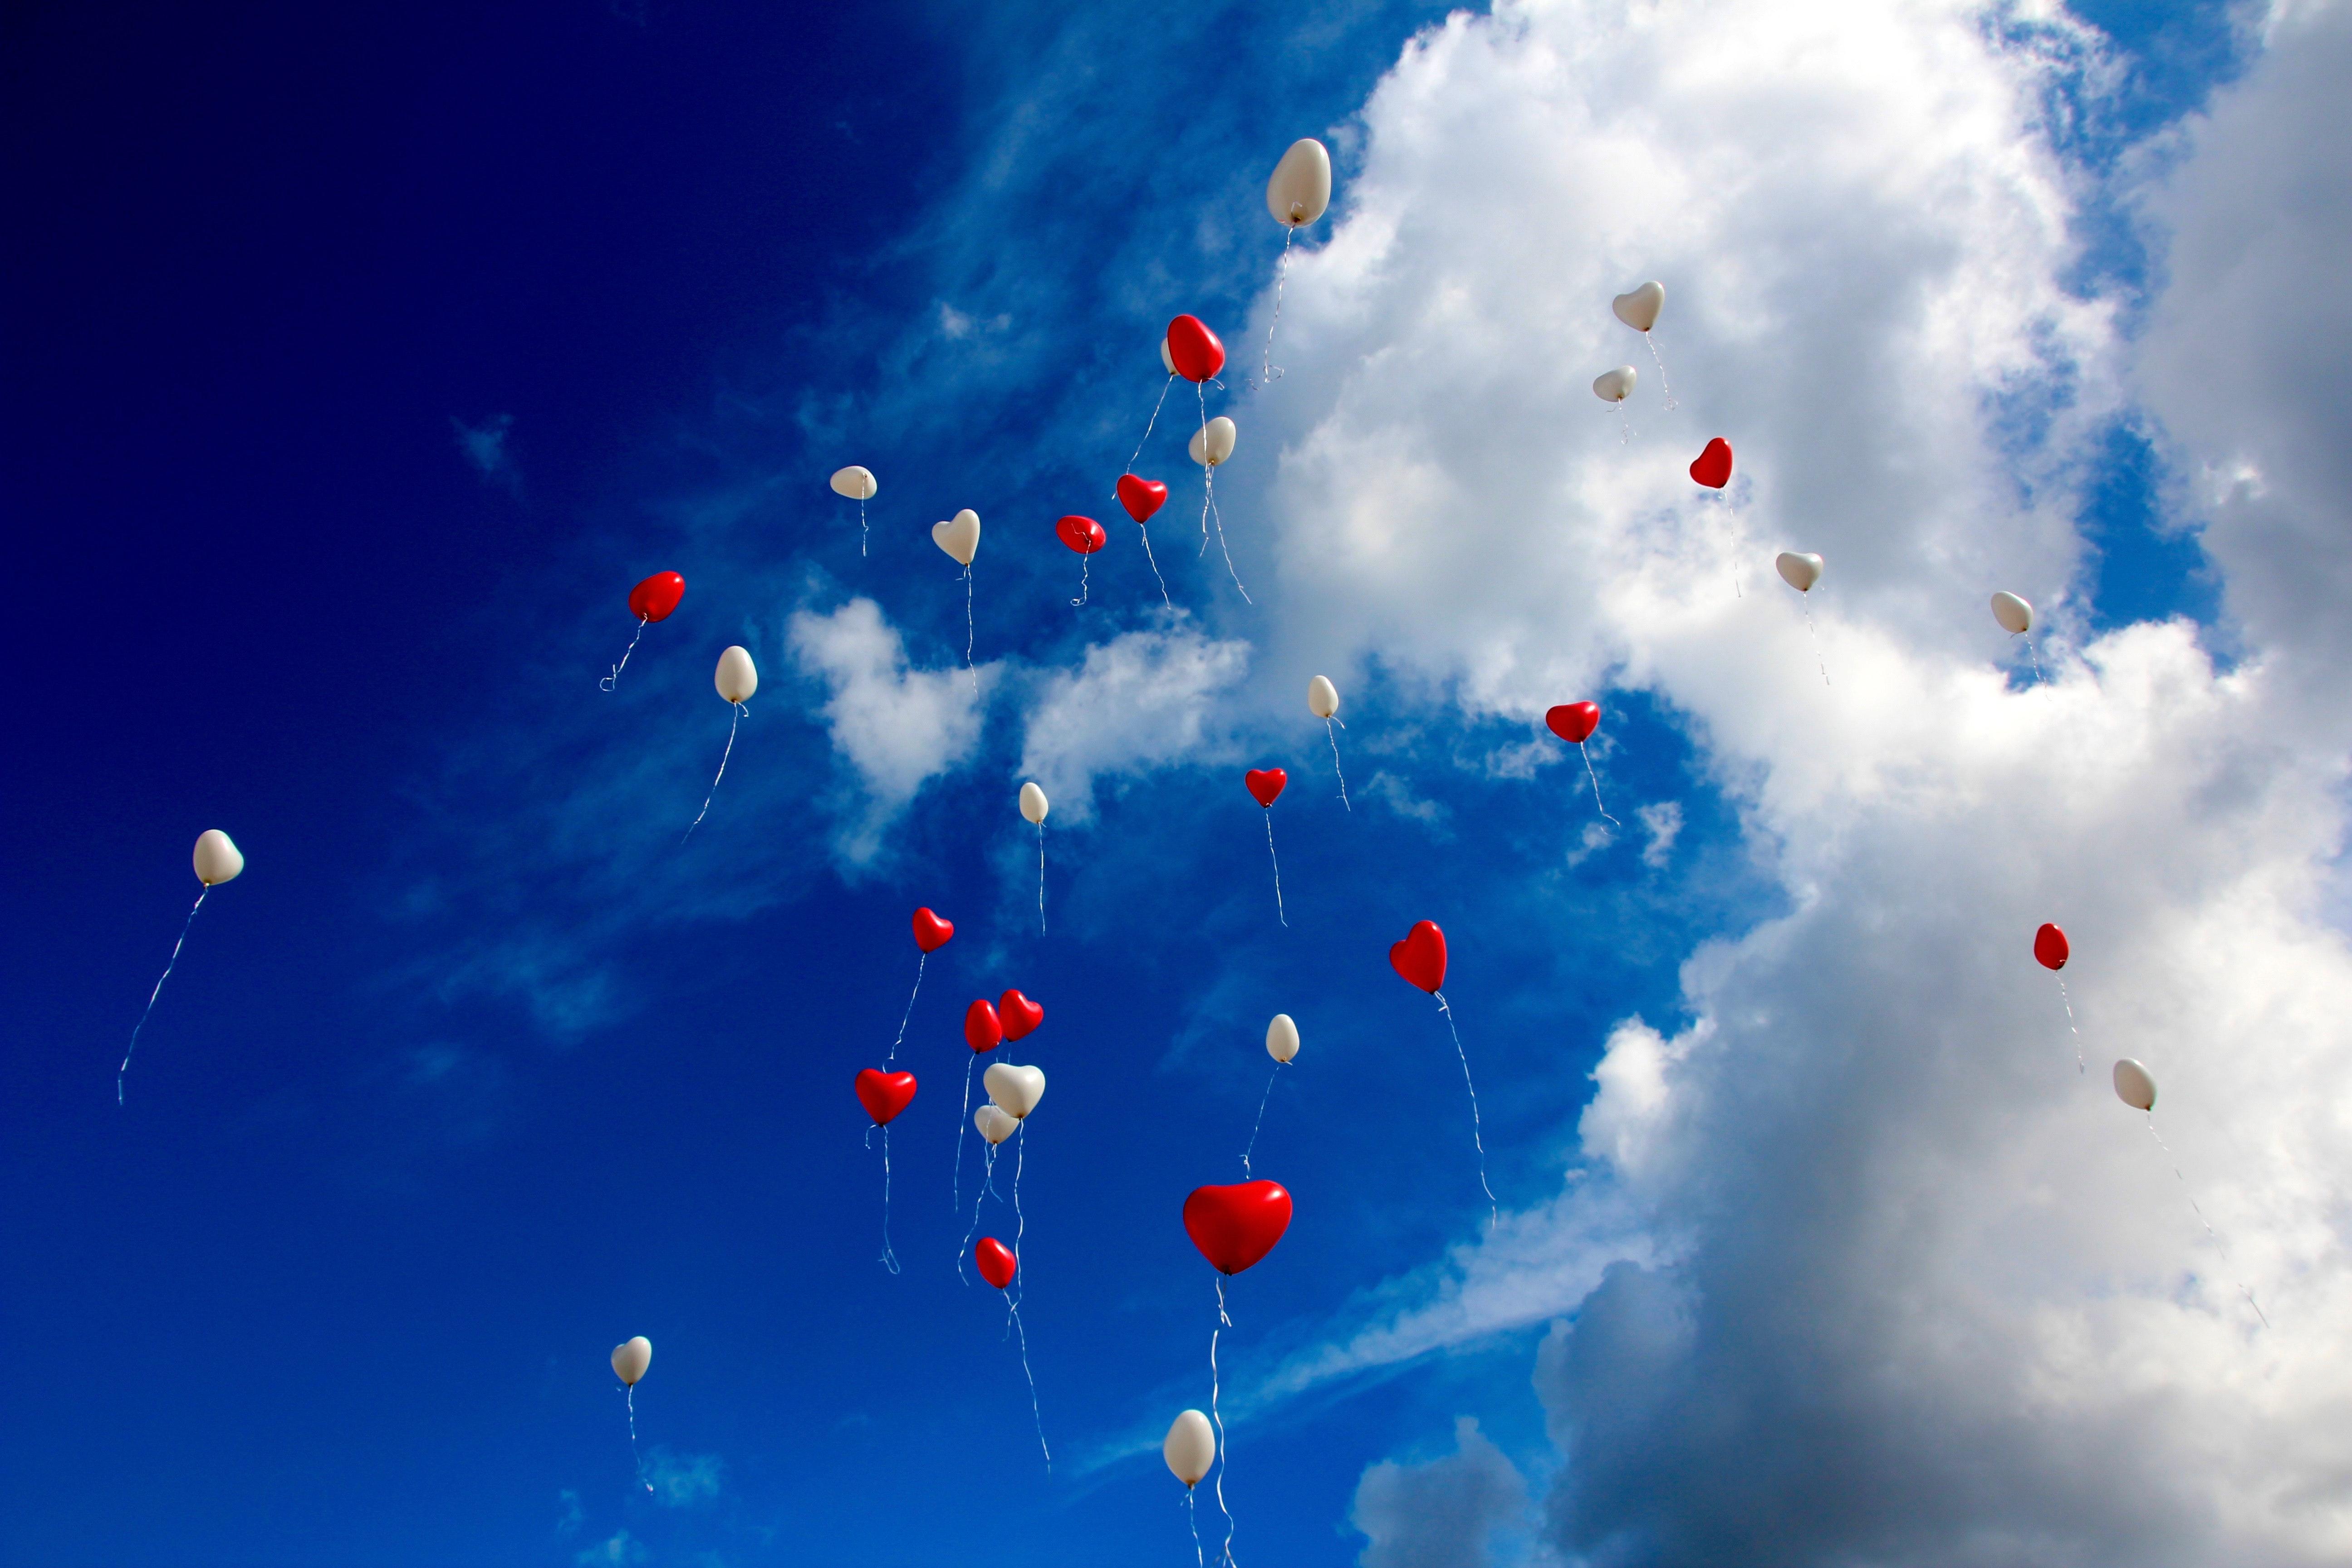 Download Wallpaper Love Blue - balloon-heart-love-romance  HD_366112.jpg\u0026fm\u003djpg